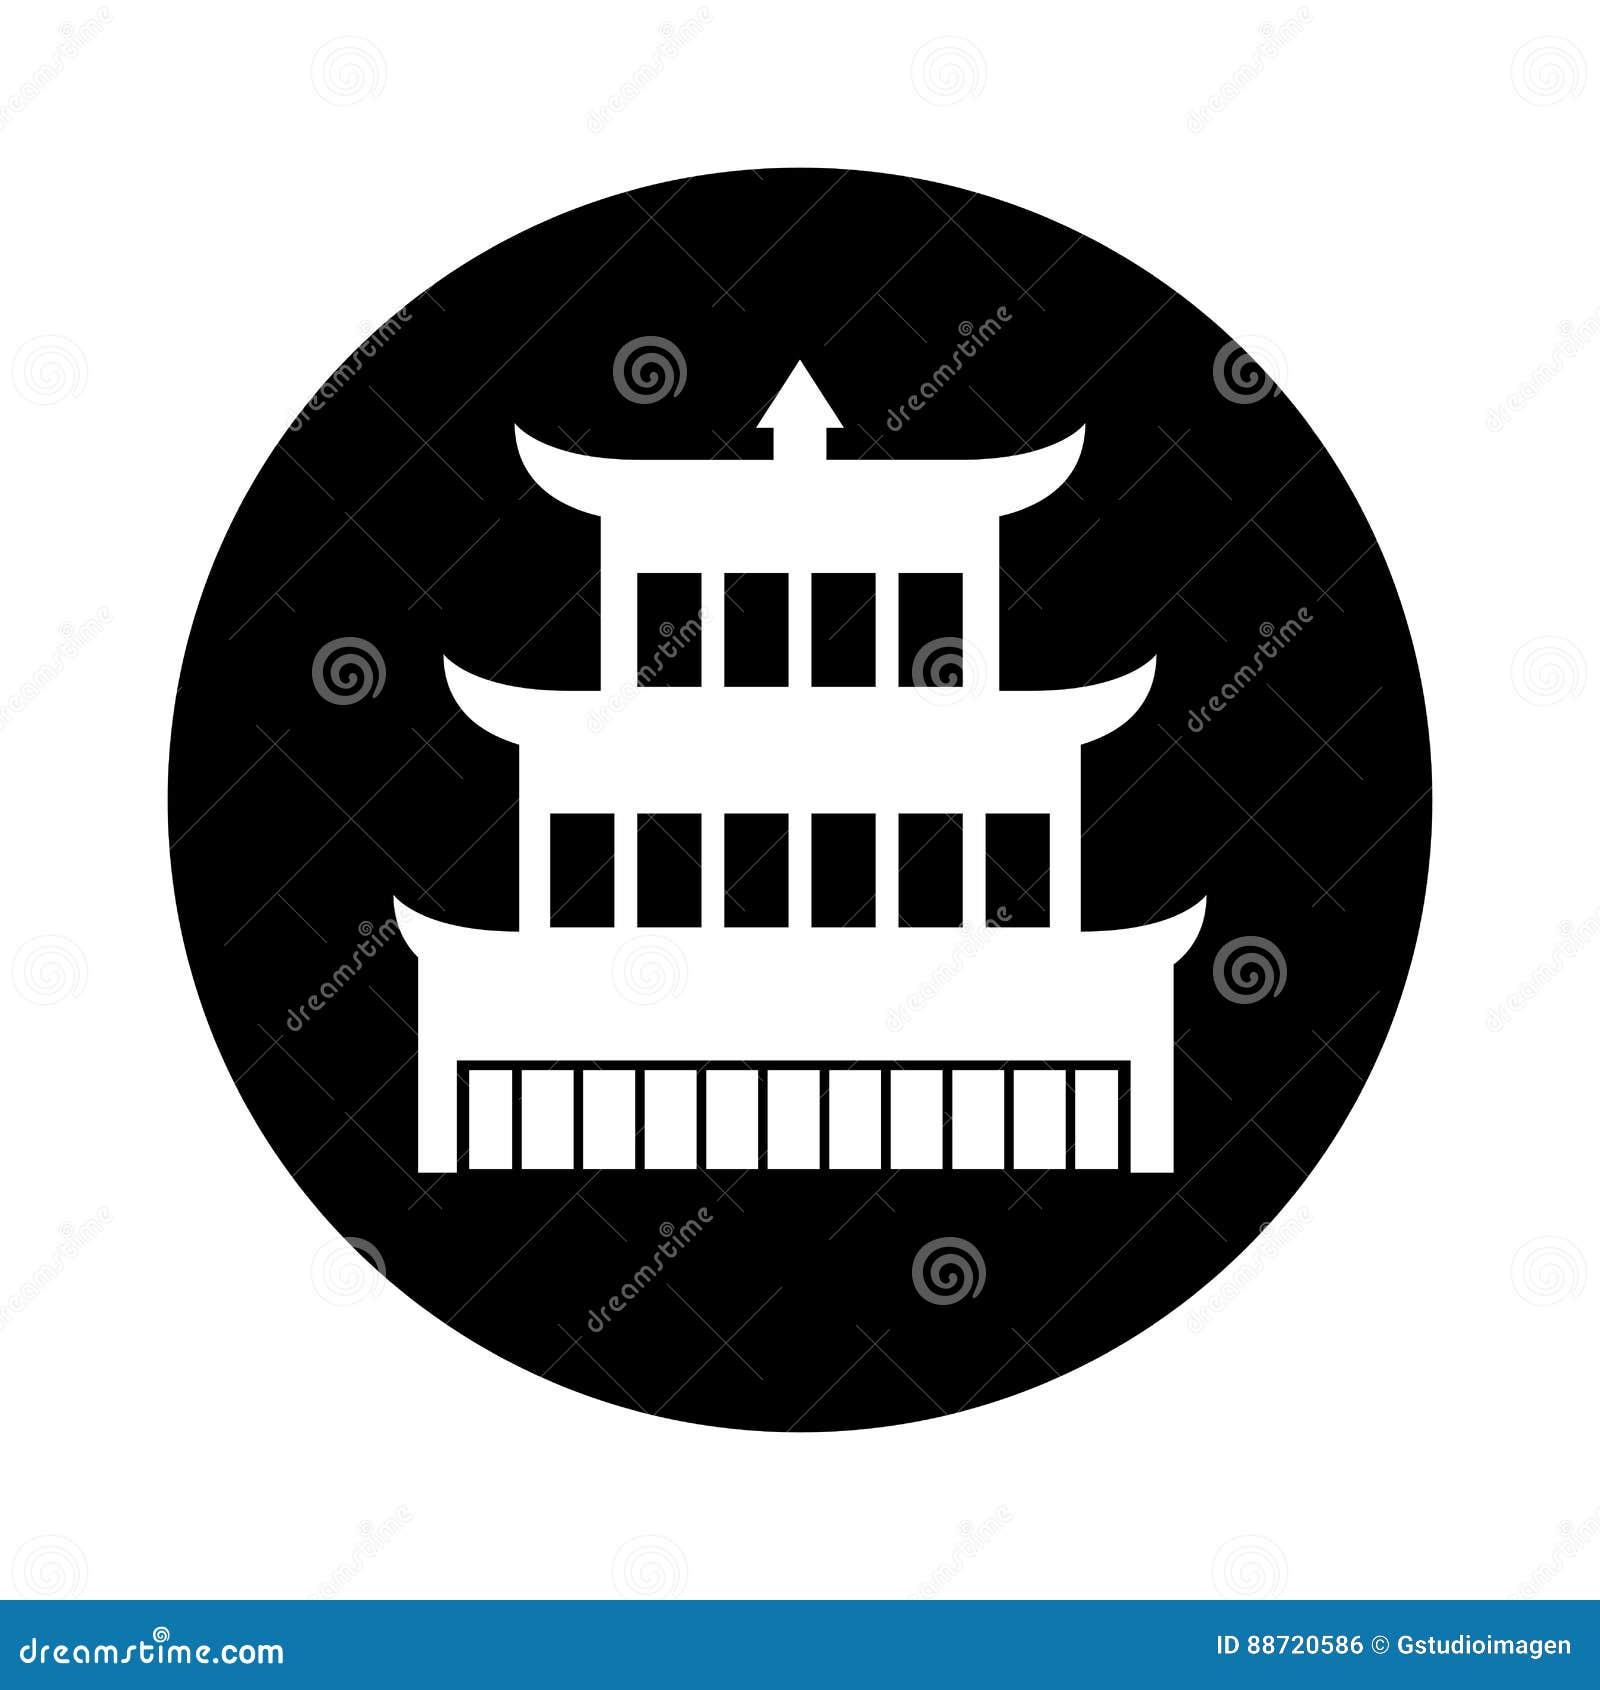 asian building castle icon stock vector - image: 88720586